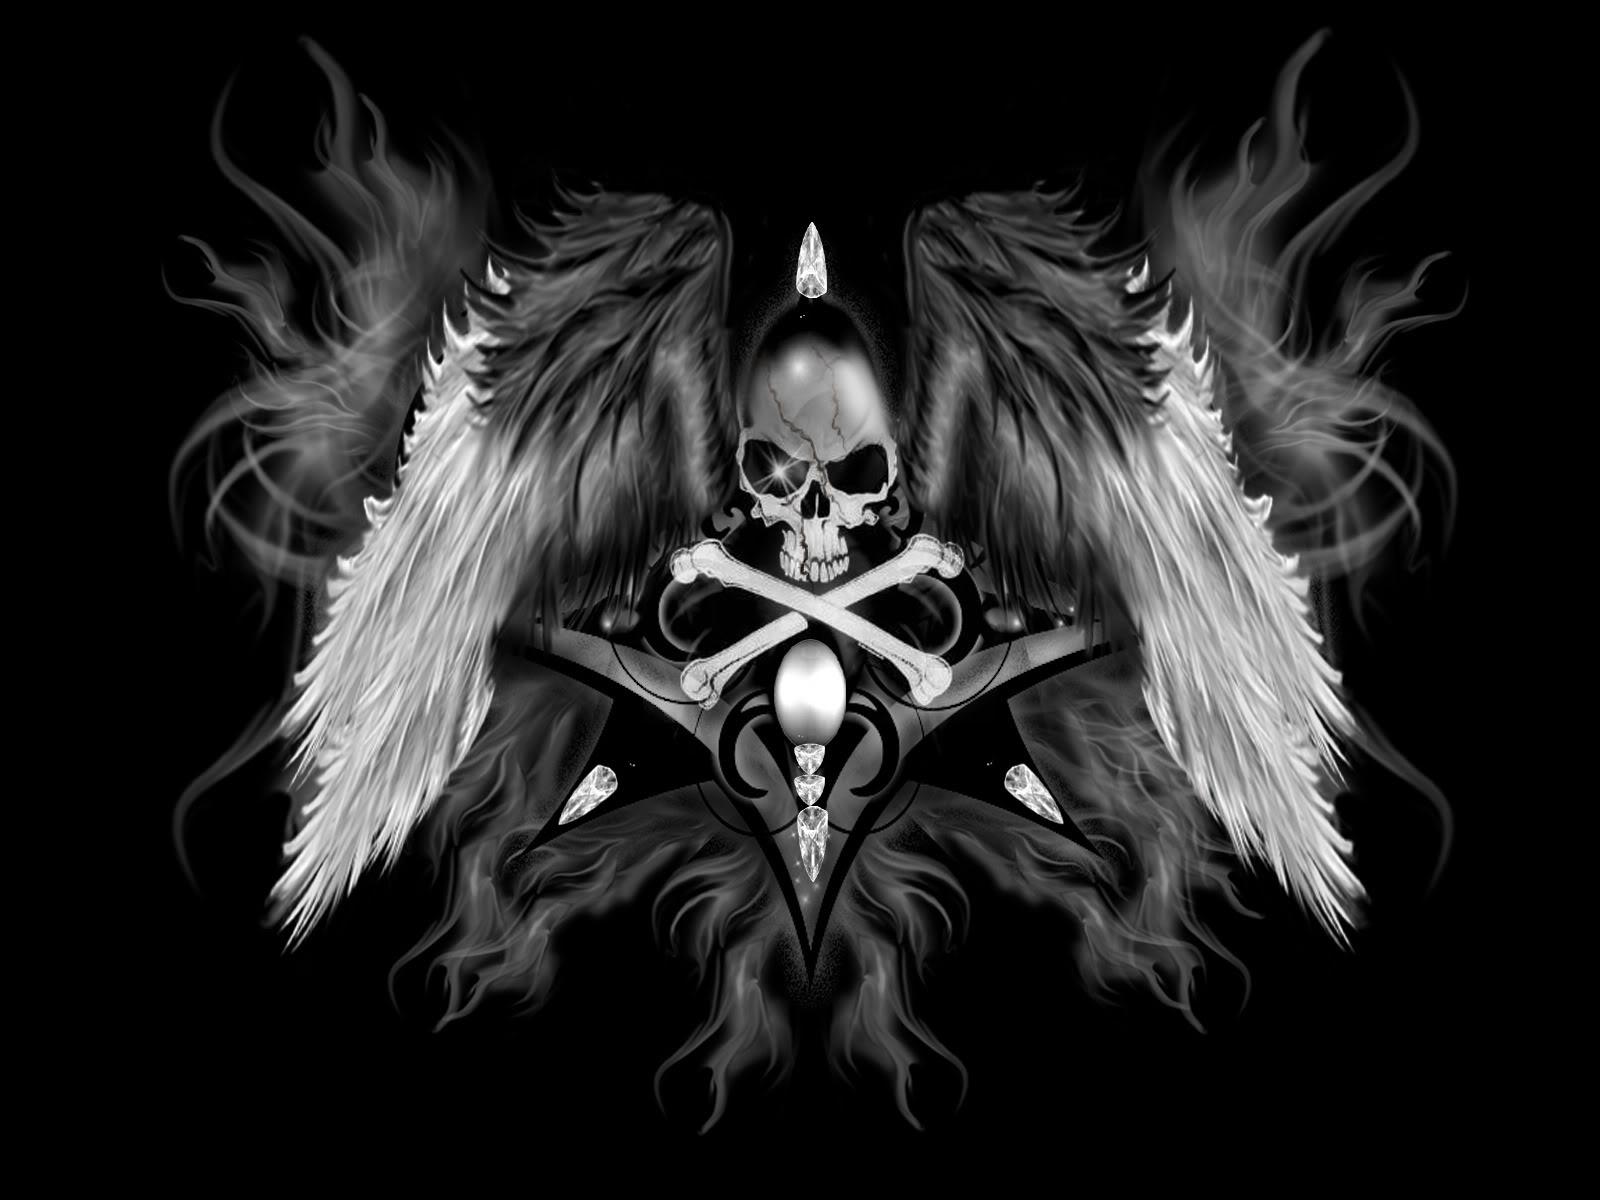 3 death angel hd wallpapers backgrounds wallpaper abyss - Death metal wallpaper ...